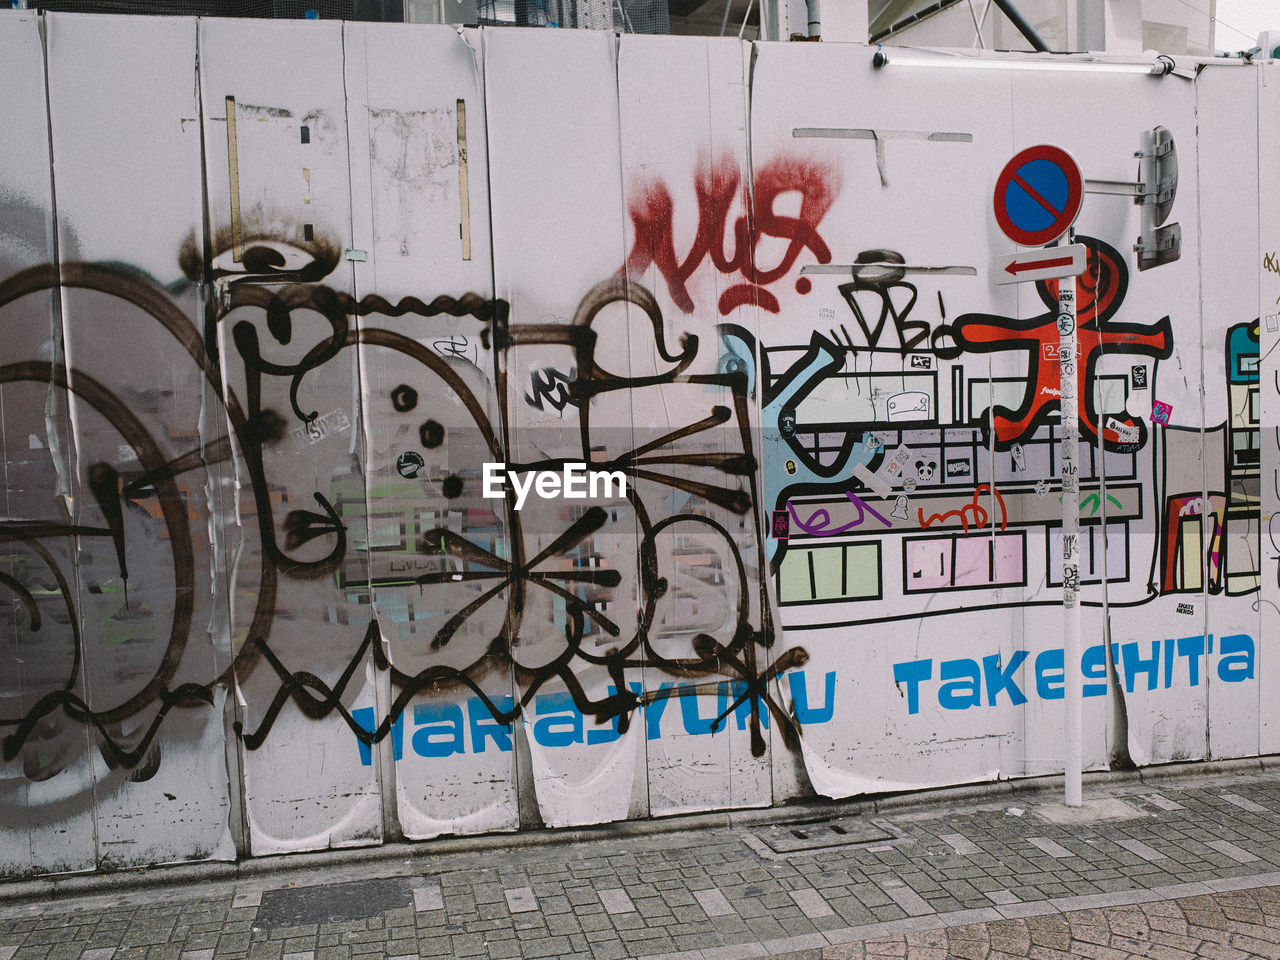 GRAFFITI ON WALL BY FOOTPATH IN CITY